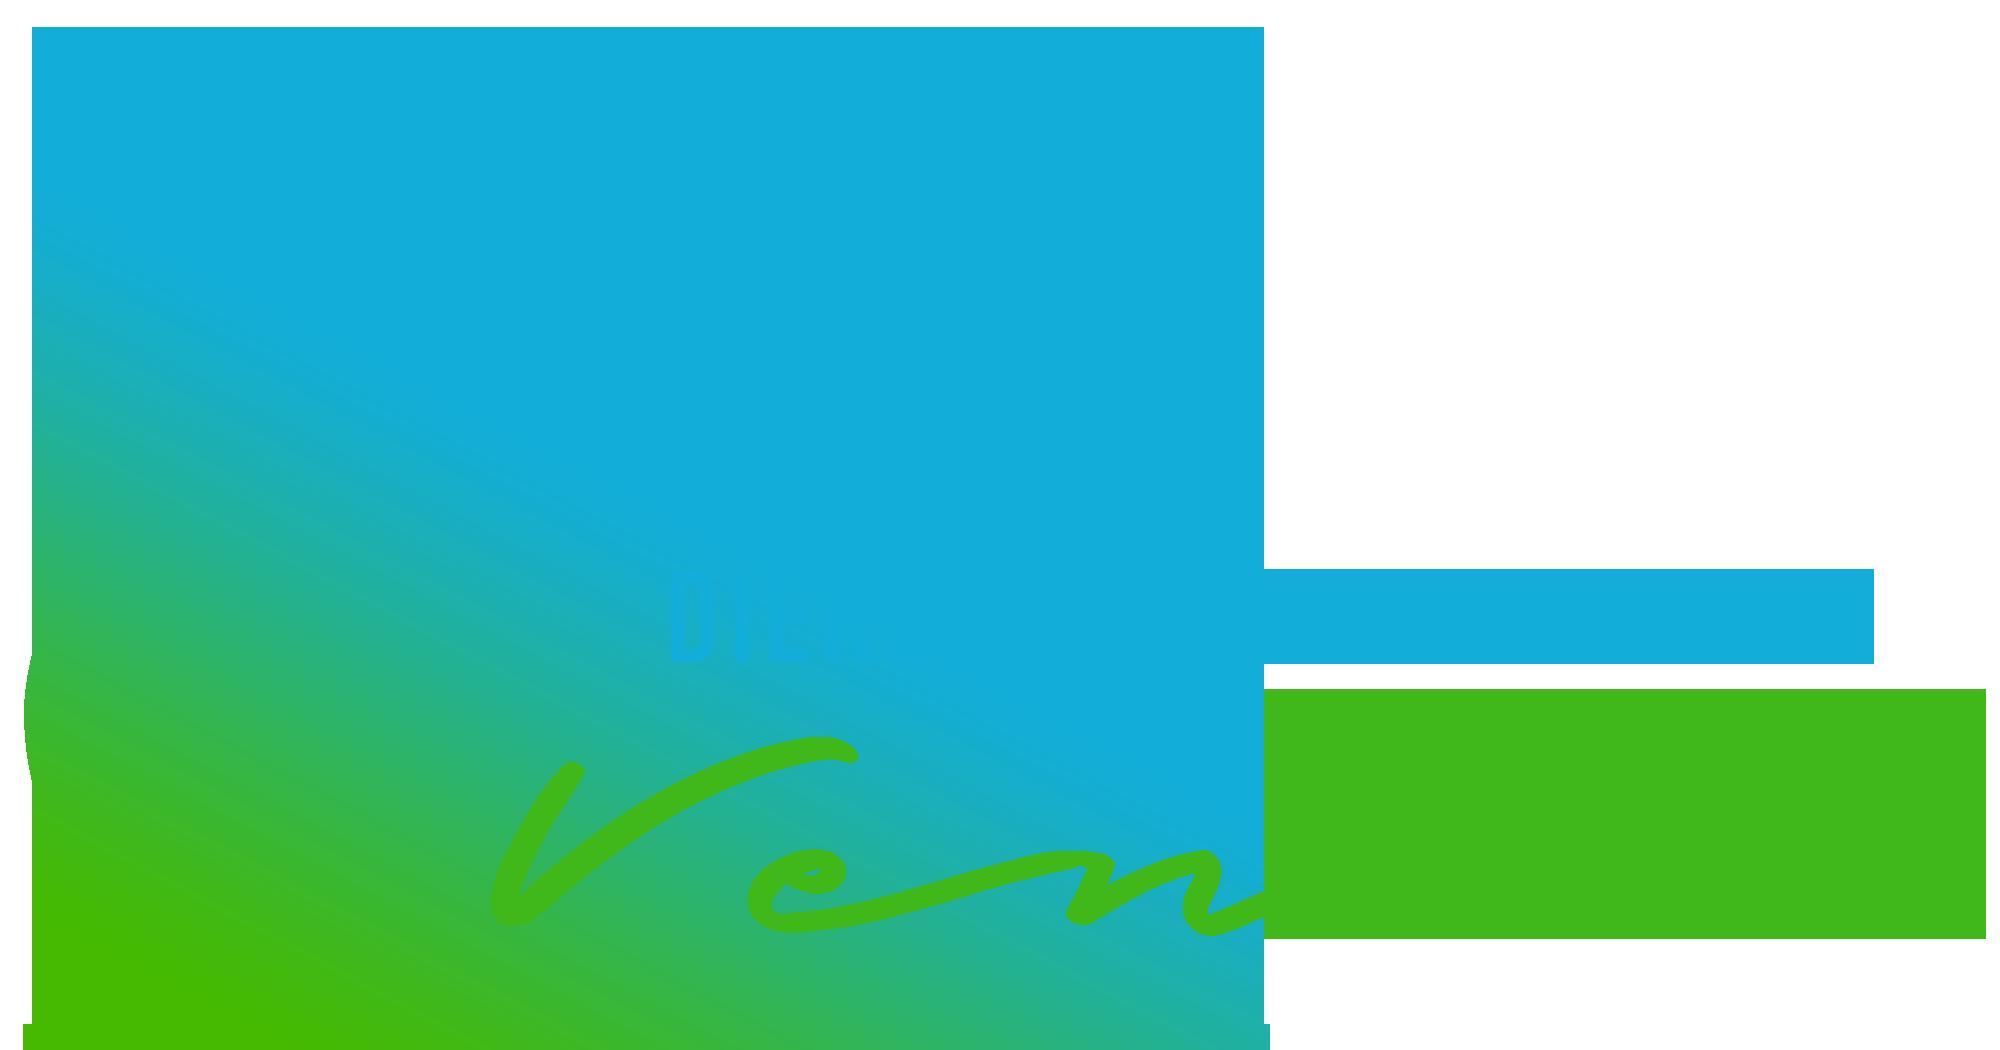 dierenuitvaartcentrum venlo logo